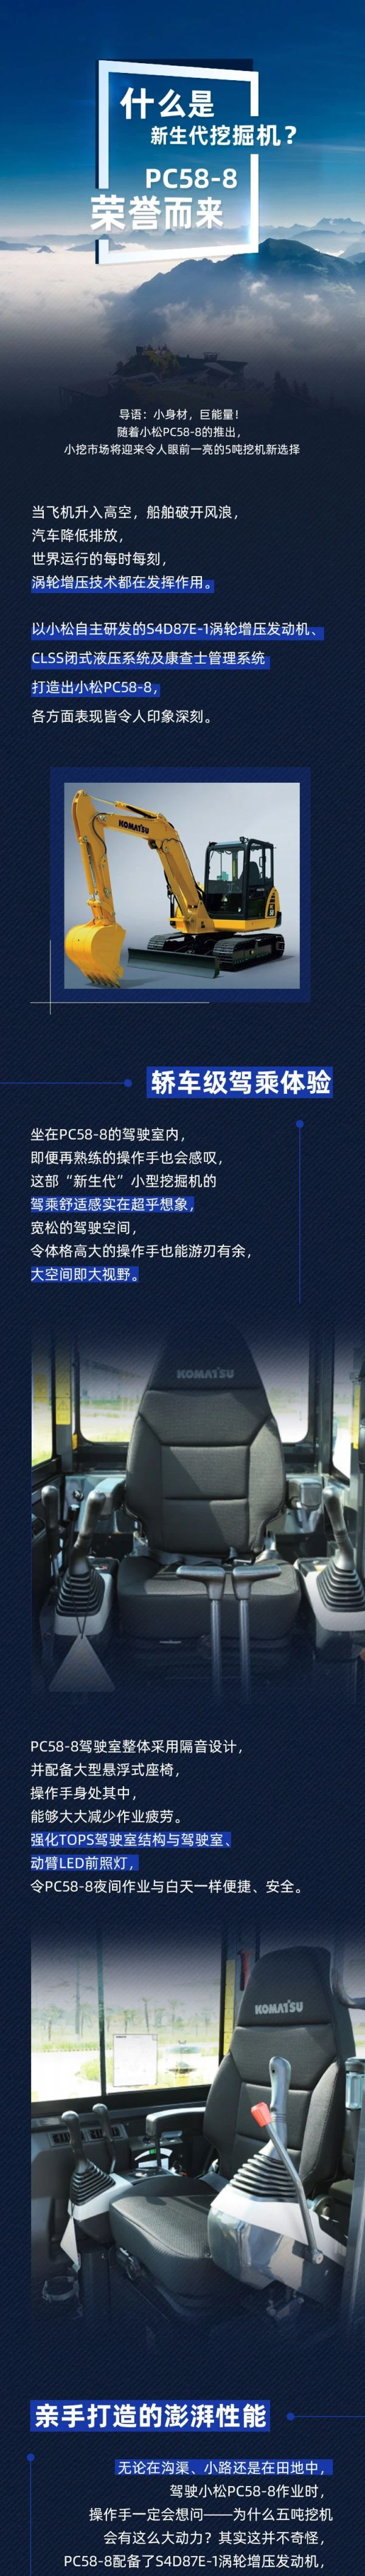 PC58-8